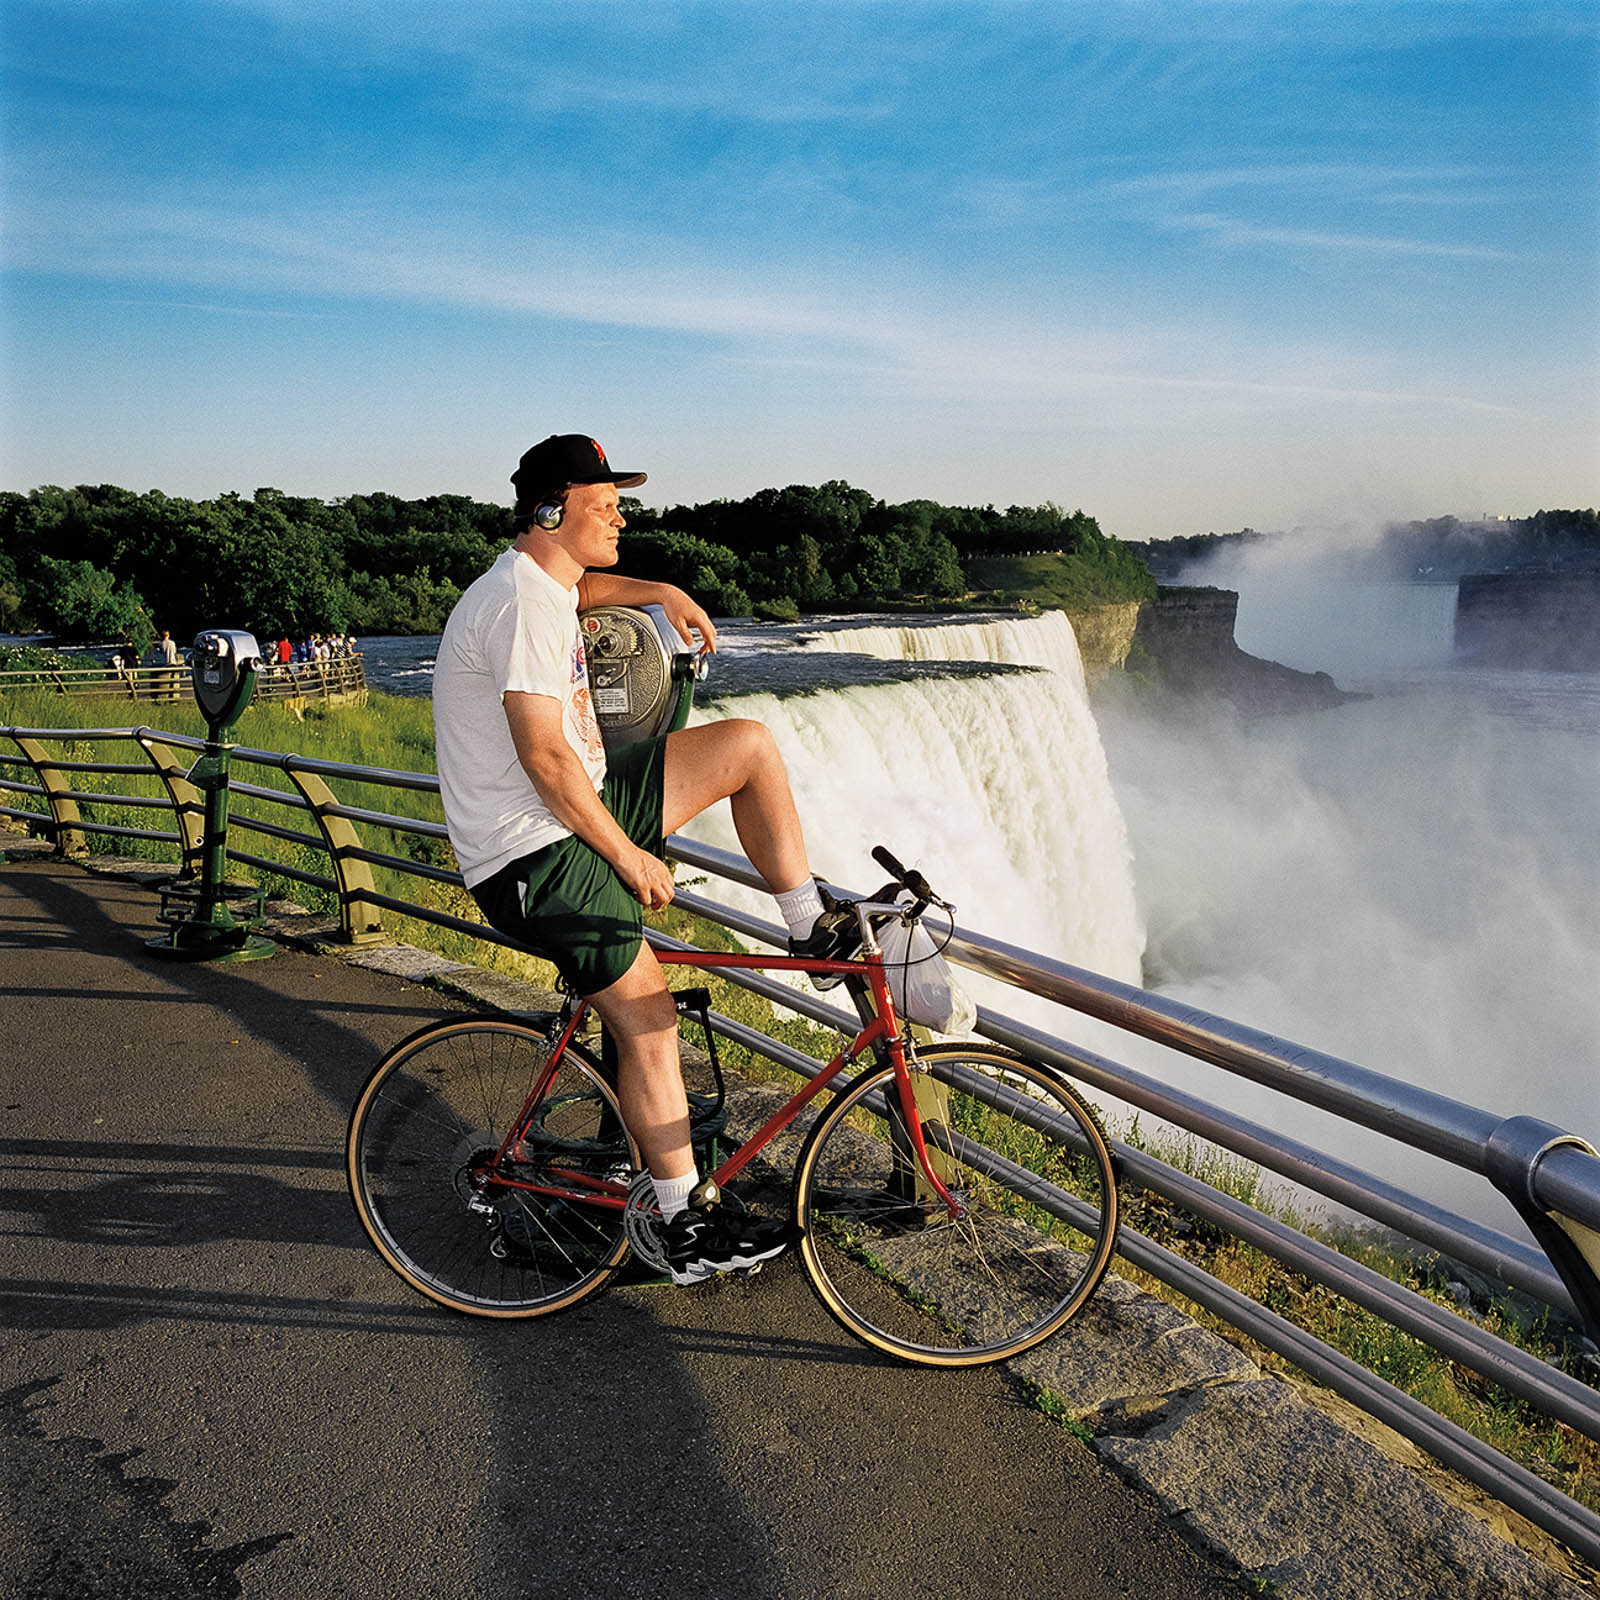 Bicyclist at Niagara Falls State Park, New York 1999